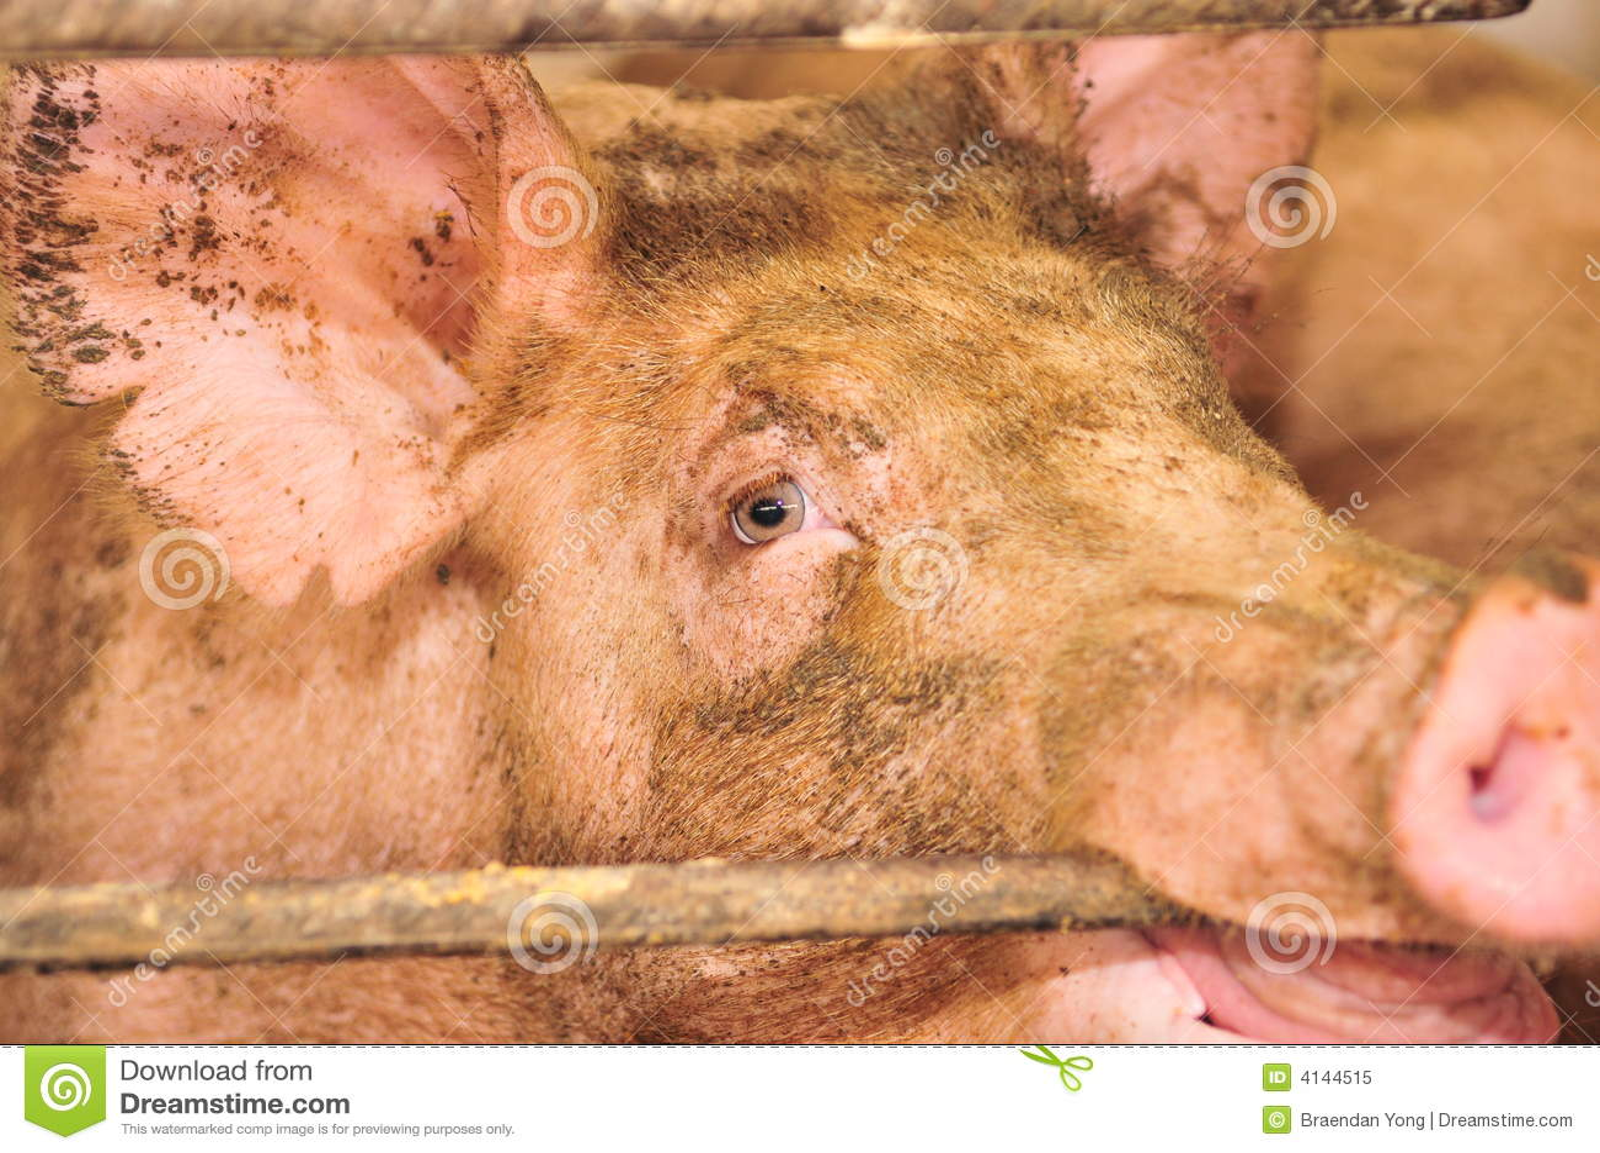 Pig woman sx vГdeo donlod porn videos